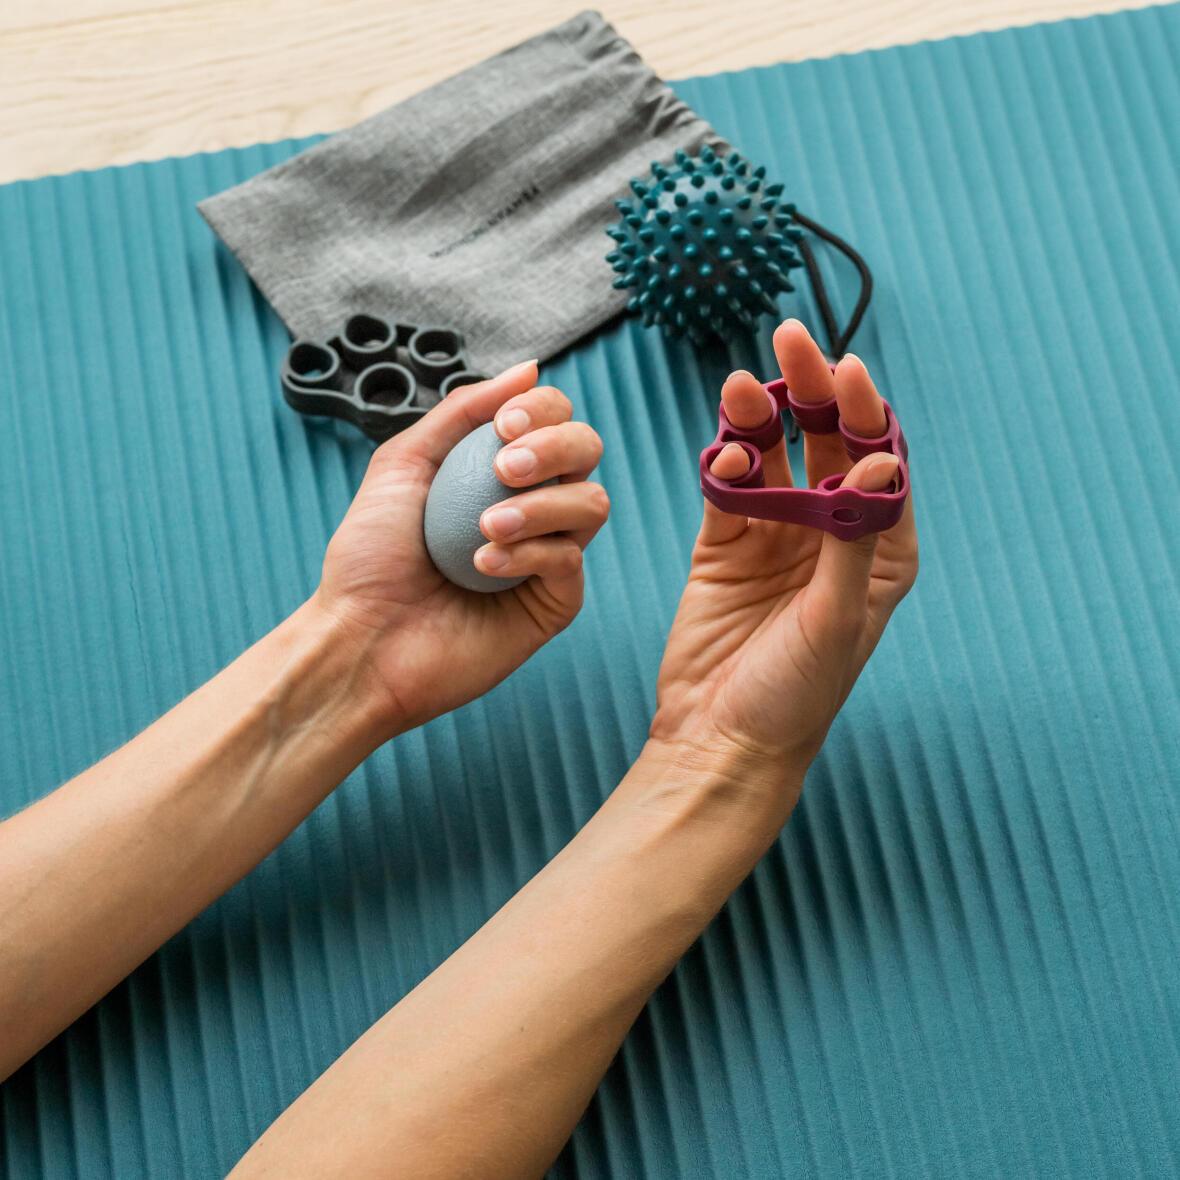 HAND MOBILITY REHABILITATION KIT